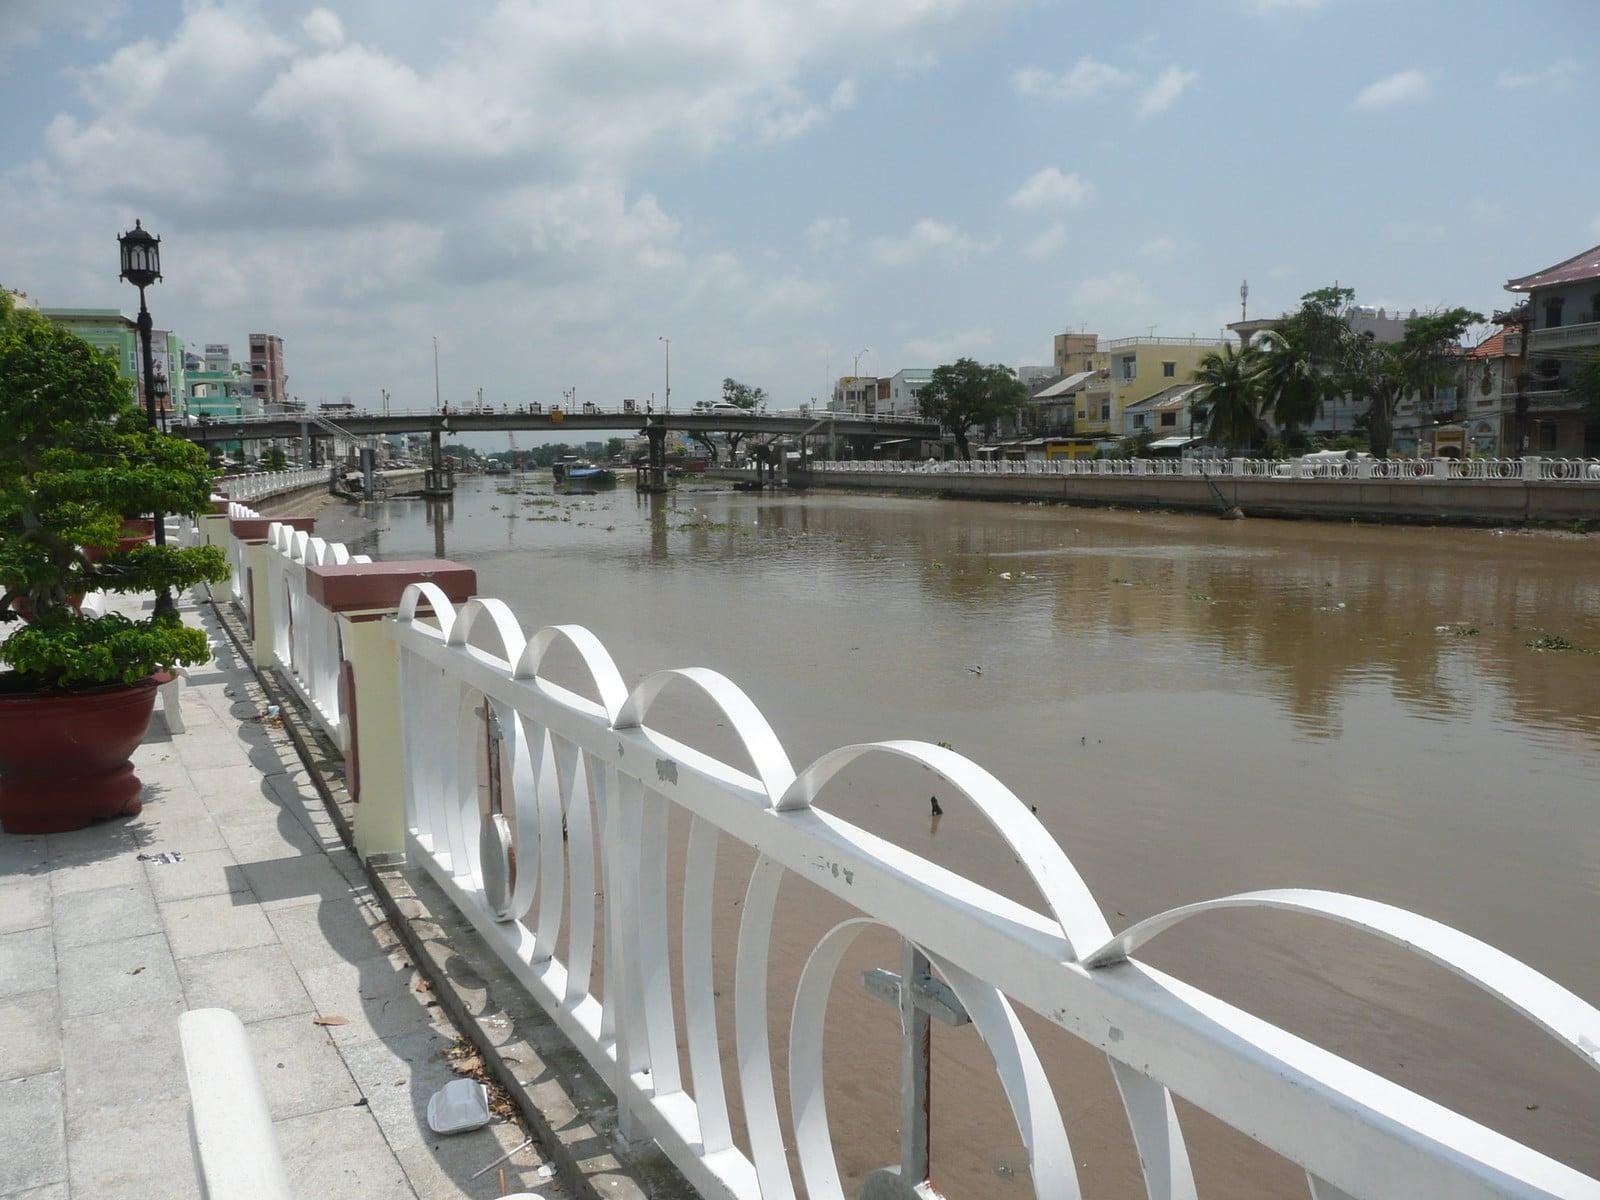 River View of Bac Liêu City, Vietnam